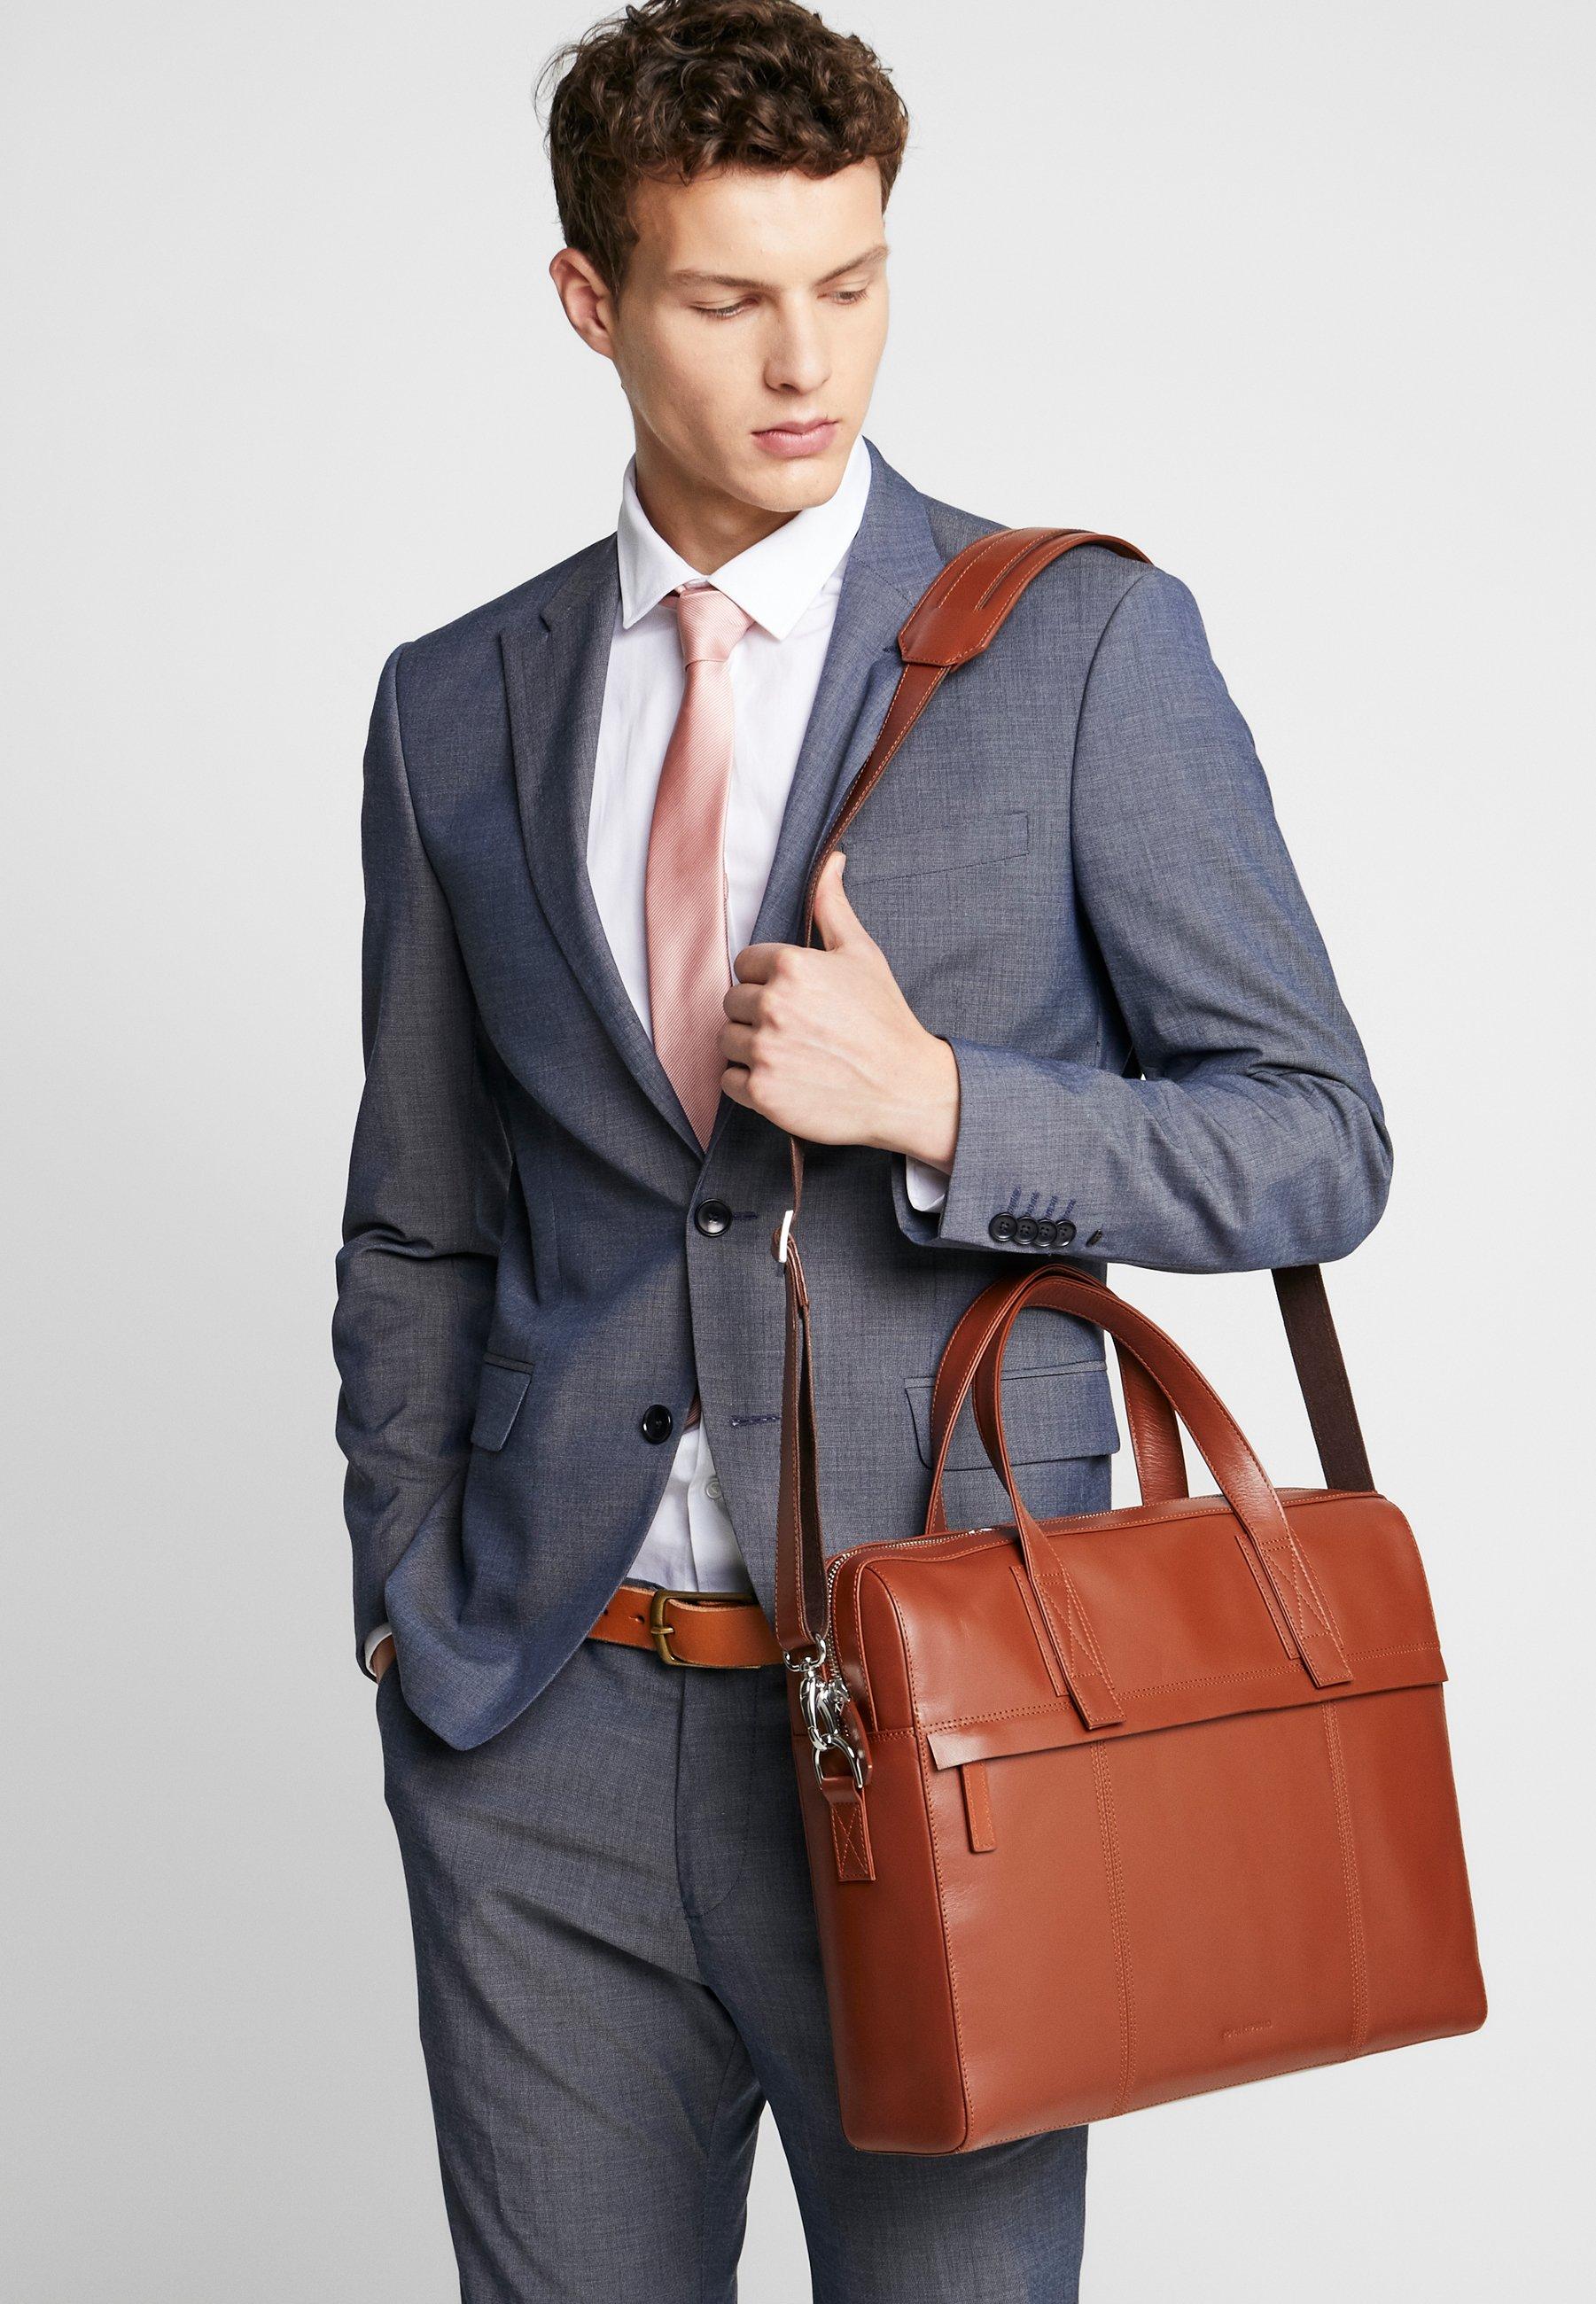 Royal Republiq Pursuit Day Bag - Stresskoffert Cognac